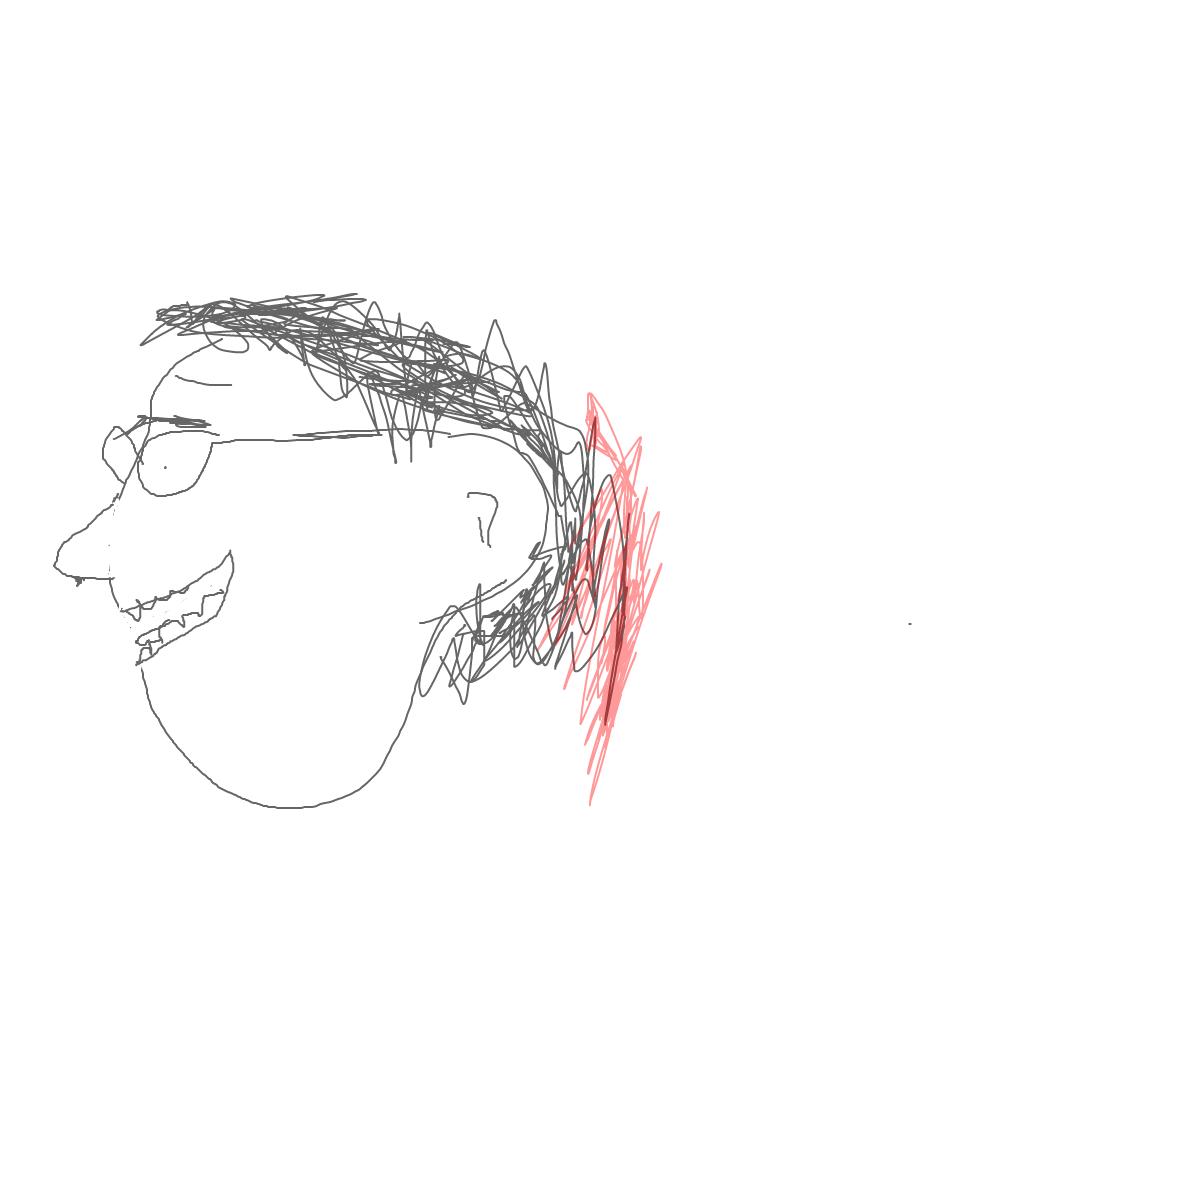 BAAAM drawing#17356 lat:51.2067413330078100lng: 3.2590017318725586